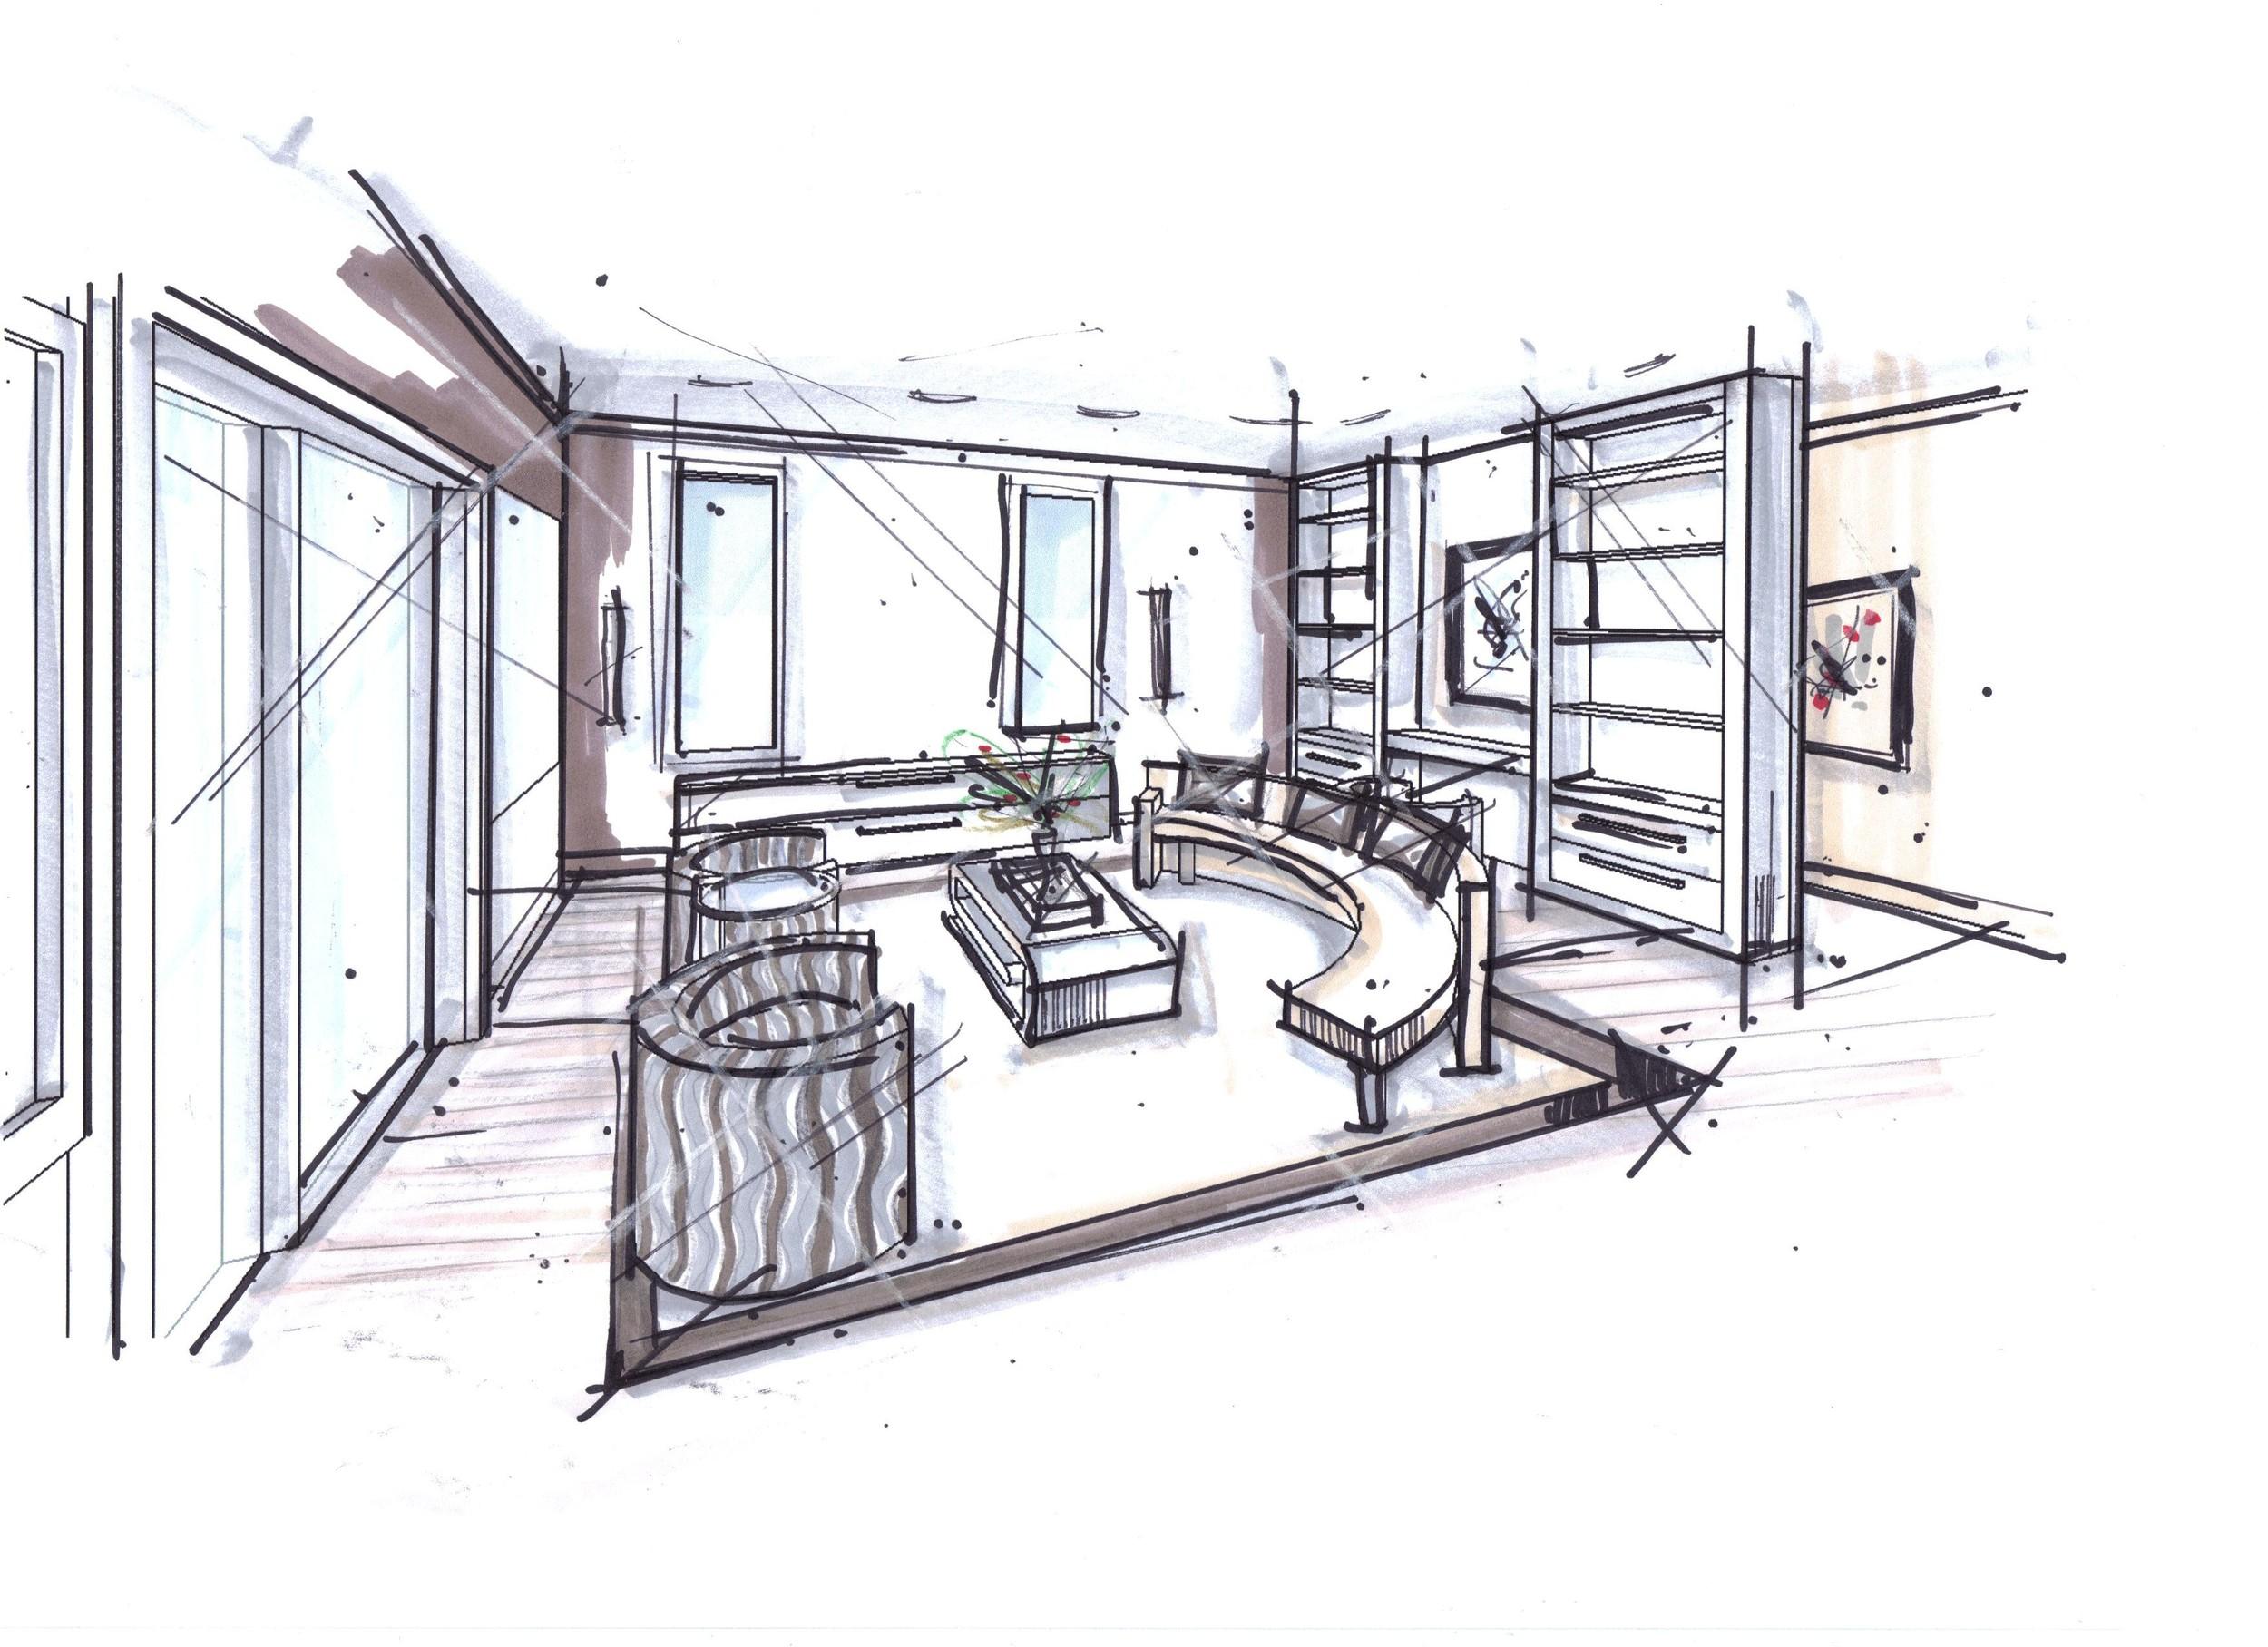 wood-furniture-design-plans_4002_3510_2550.jpg